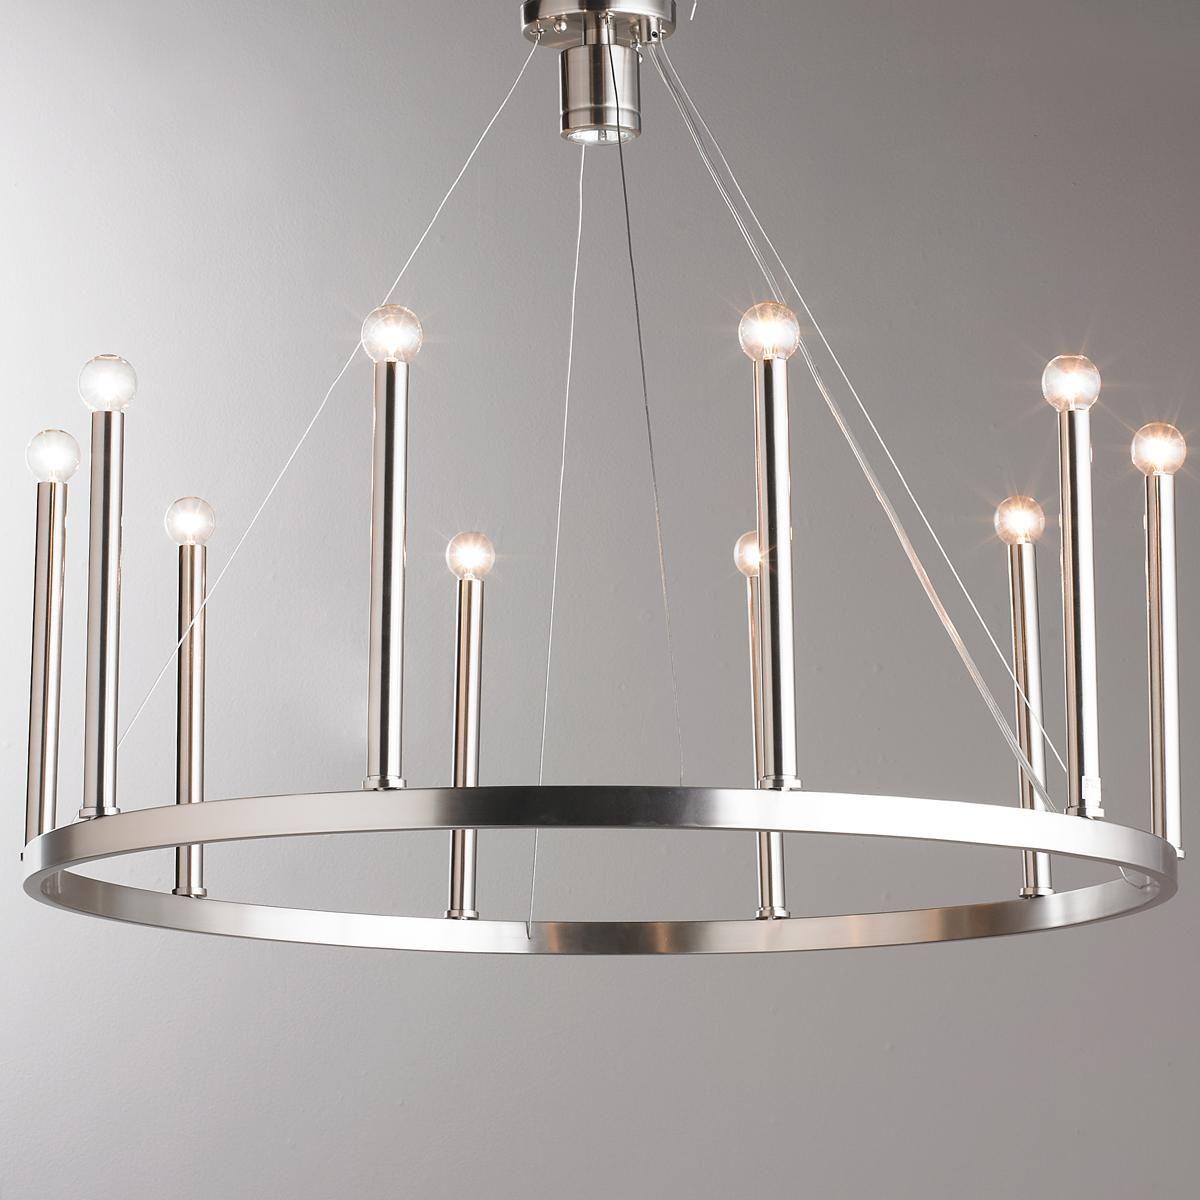 Euro Modern Candelabra Chandelier – 11 Light | Modern Inside Eastbourne 6 Light Unique / Statement Chandeliers (Gallery 23 of 30)